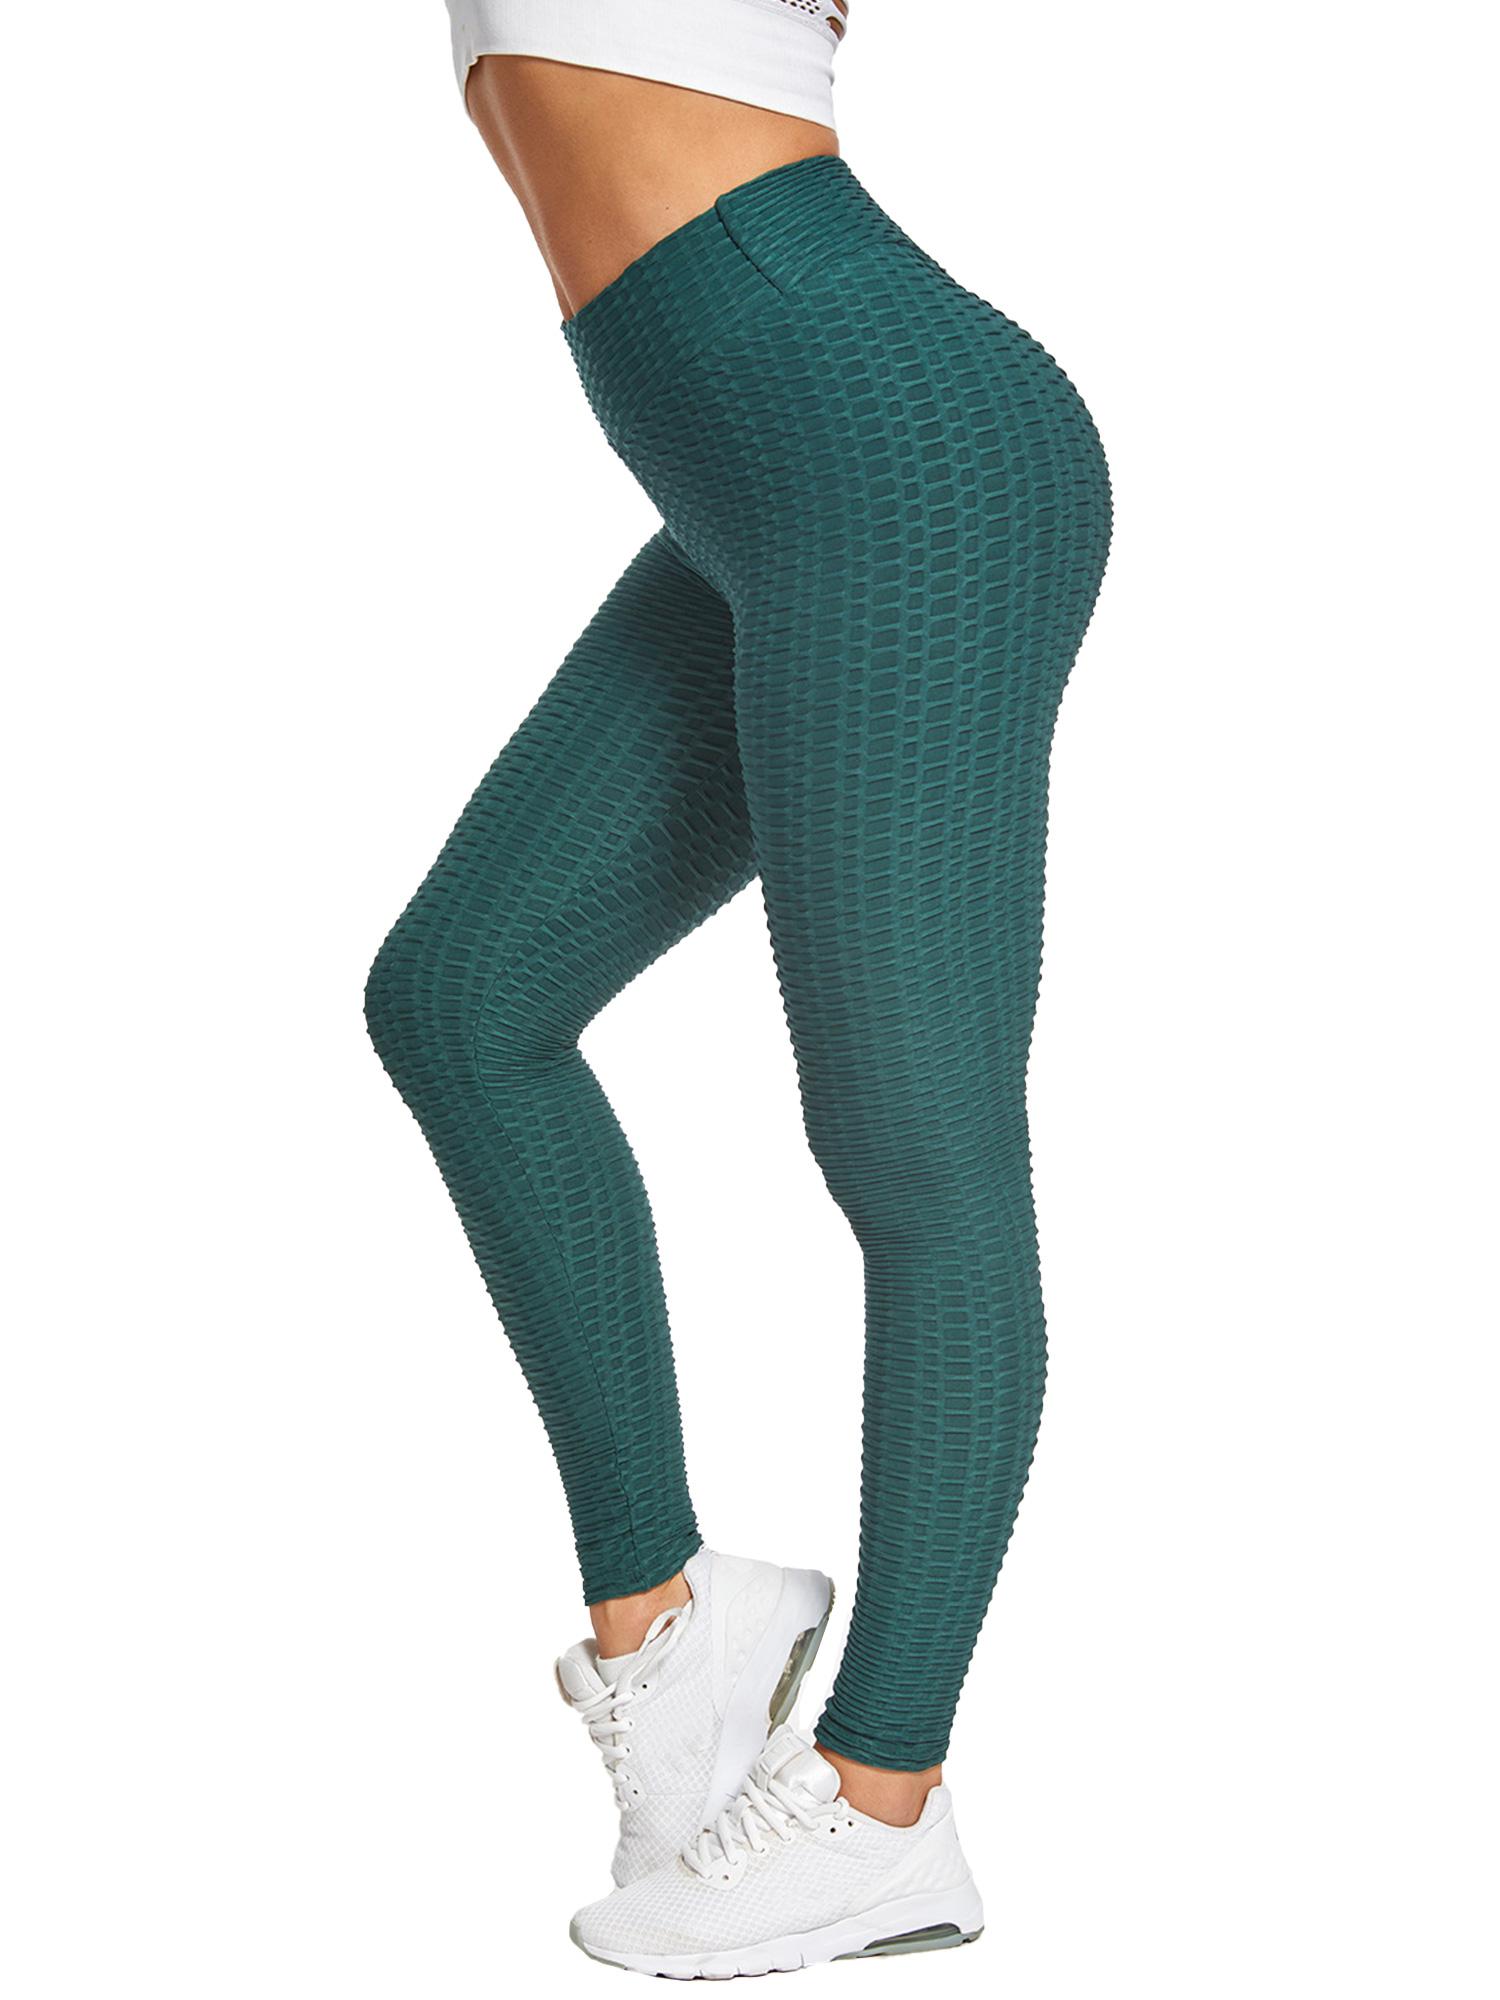 Women Seamless Leggings Yoga Pants High Waist Push Up Fitness Sports Gym Workout